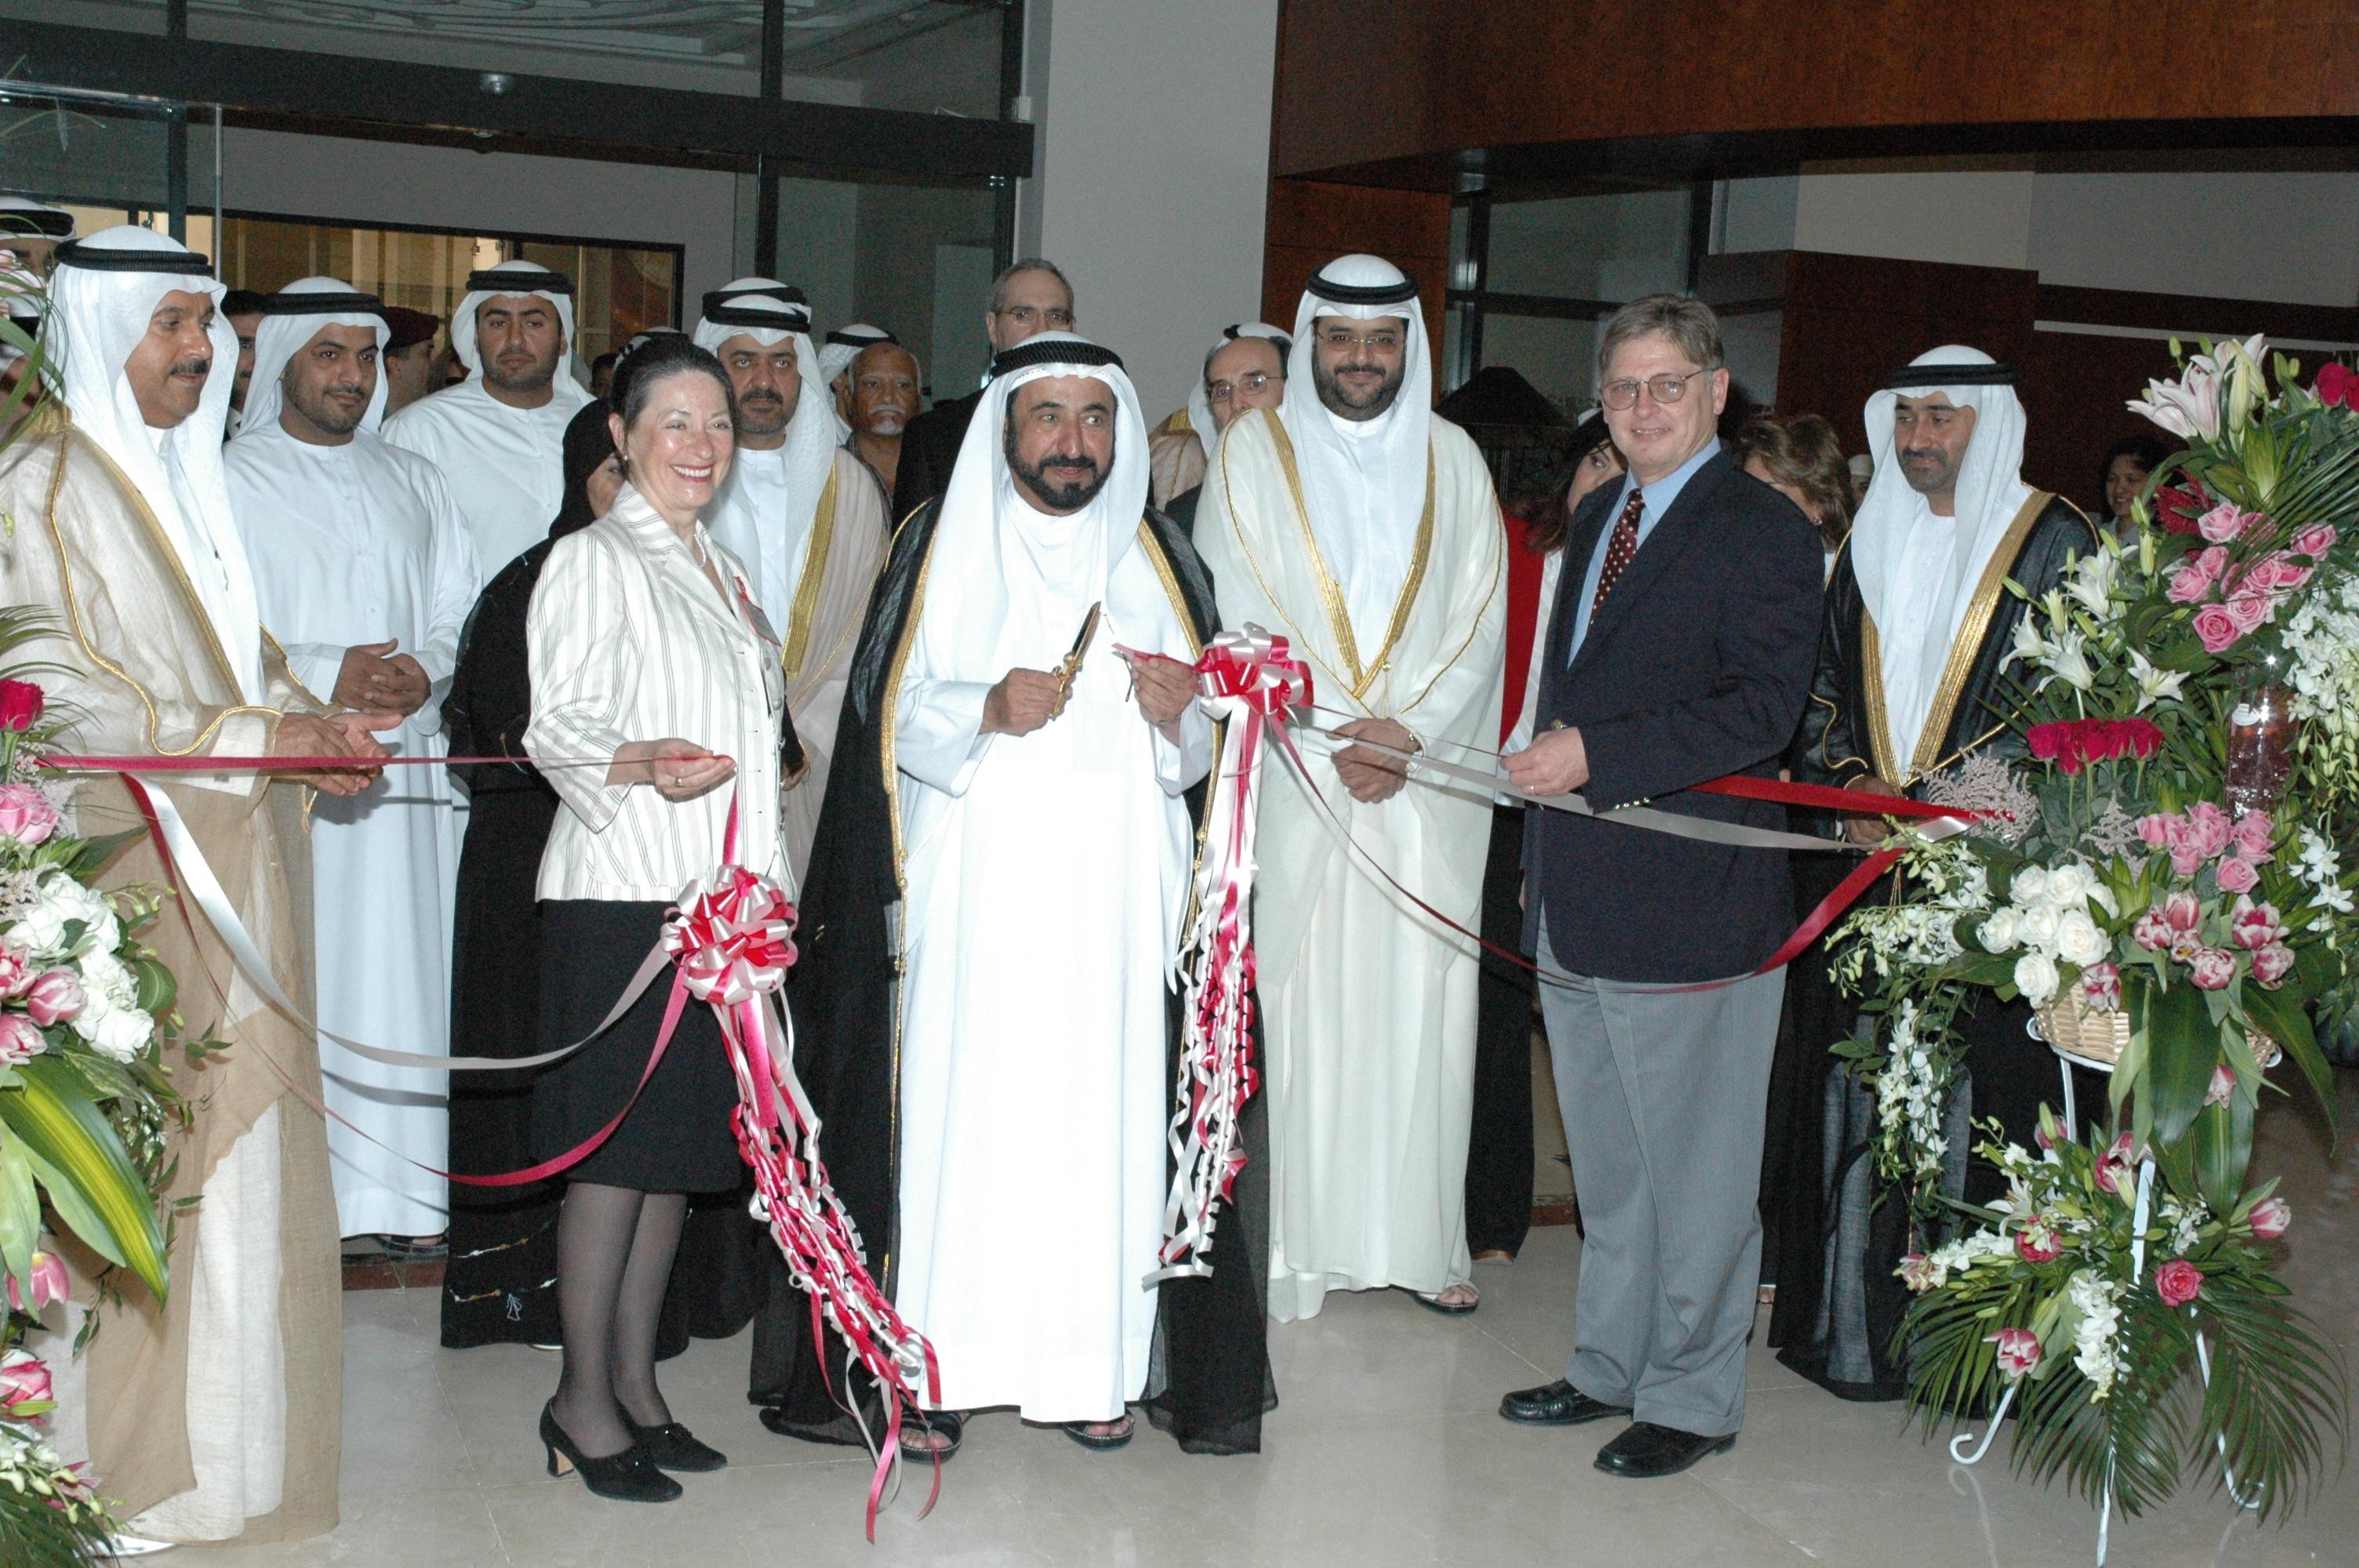 American_University_of_Sharjah_Library_3.jpg